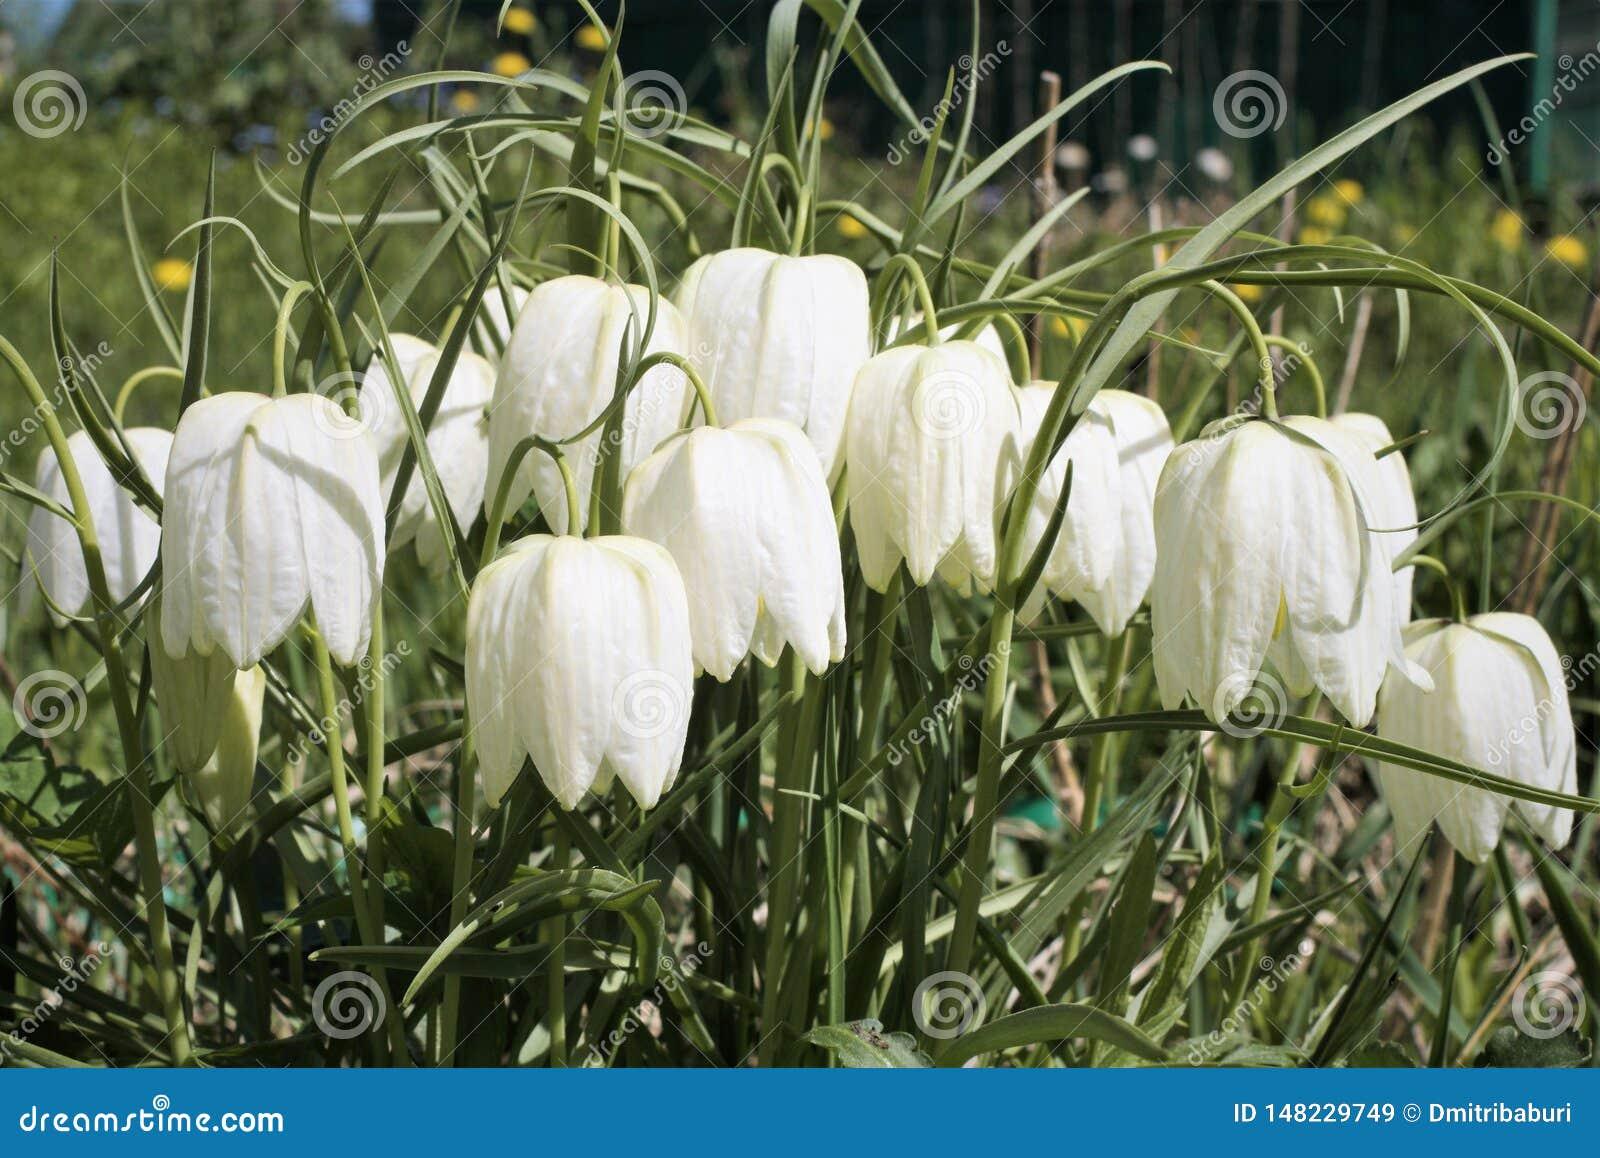 Fritillaria Meleagris Alba or White Hazel Grouse in Early Spring ...